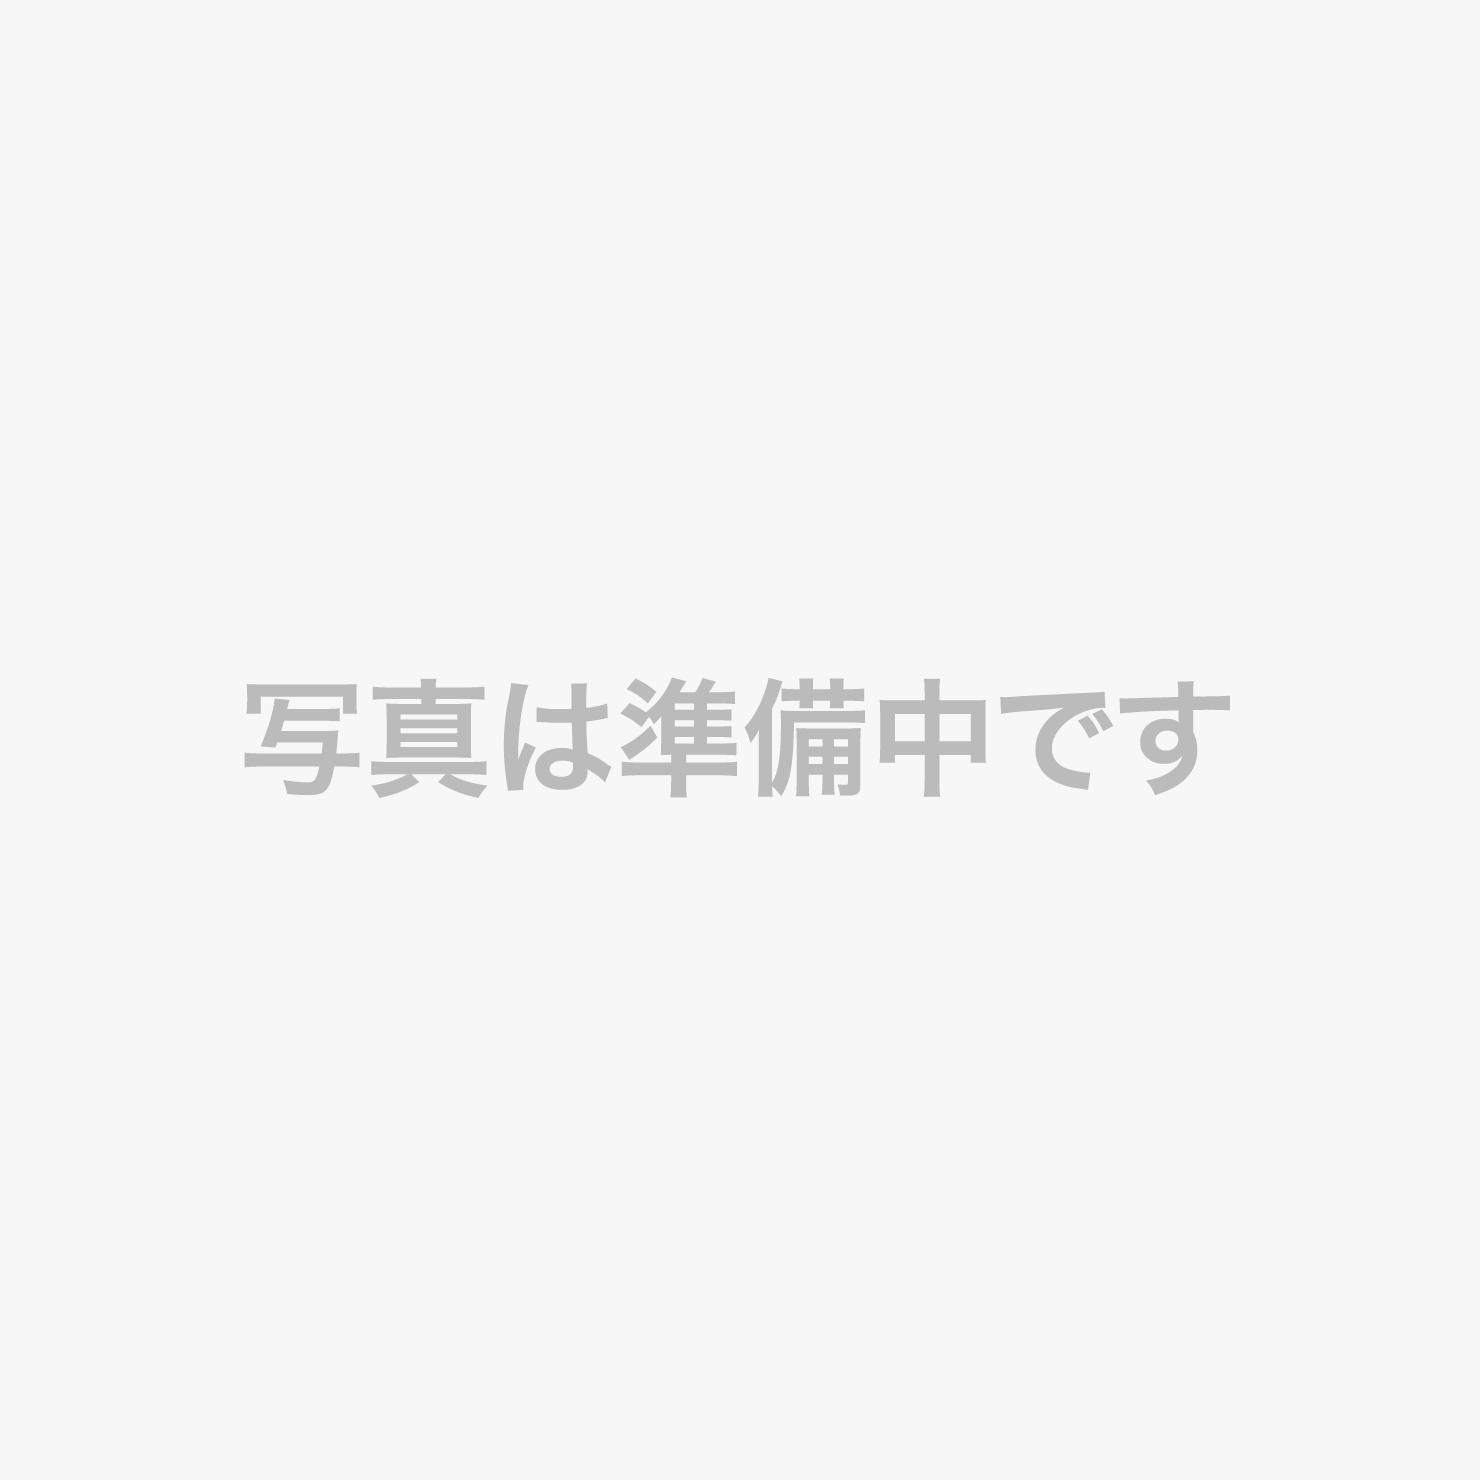 【バーラウンジ】